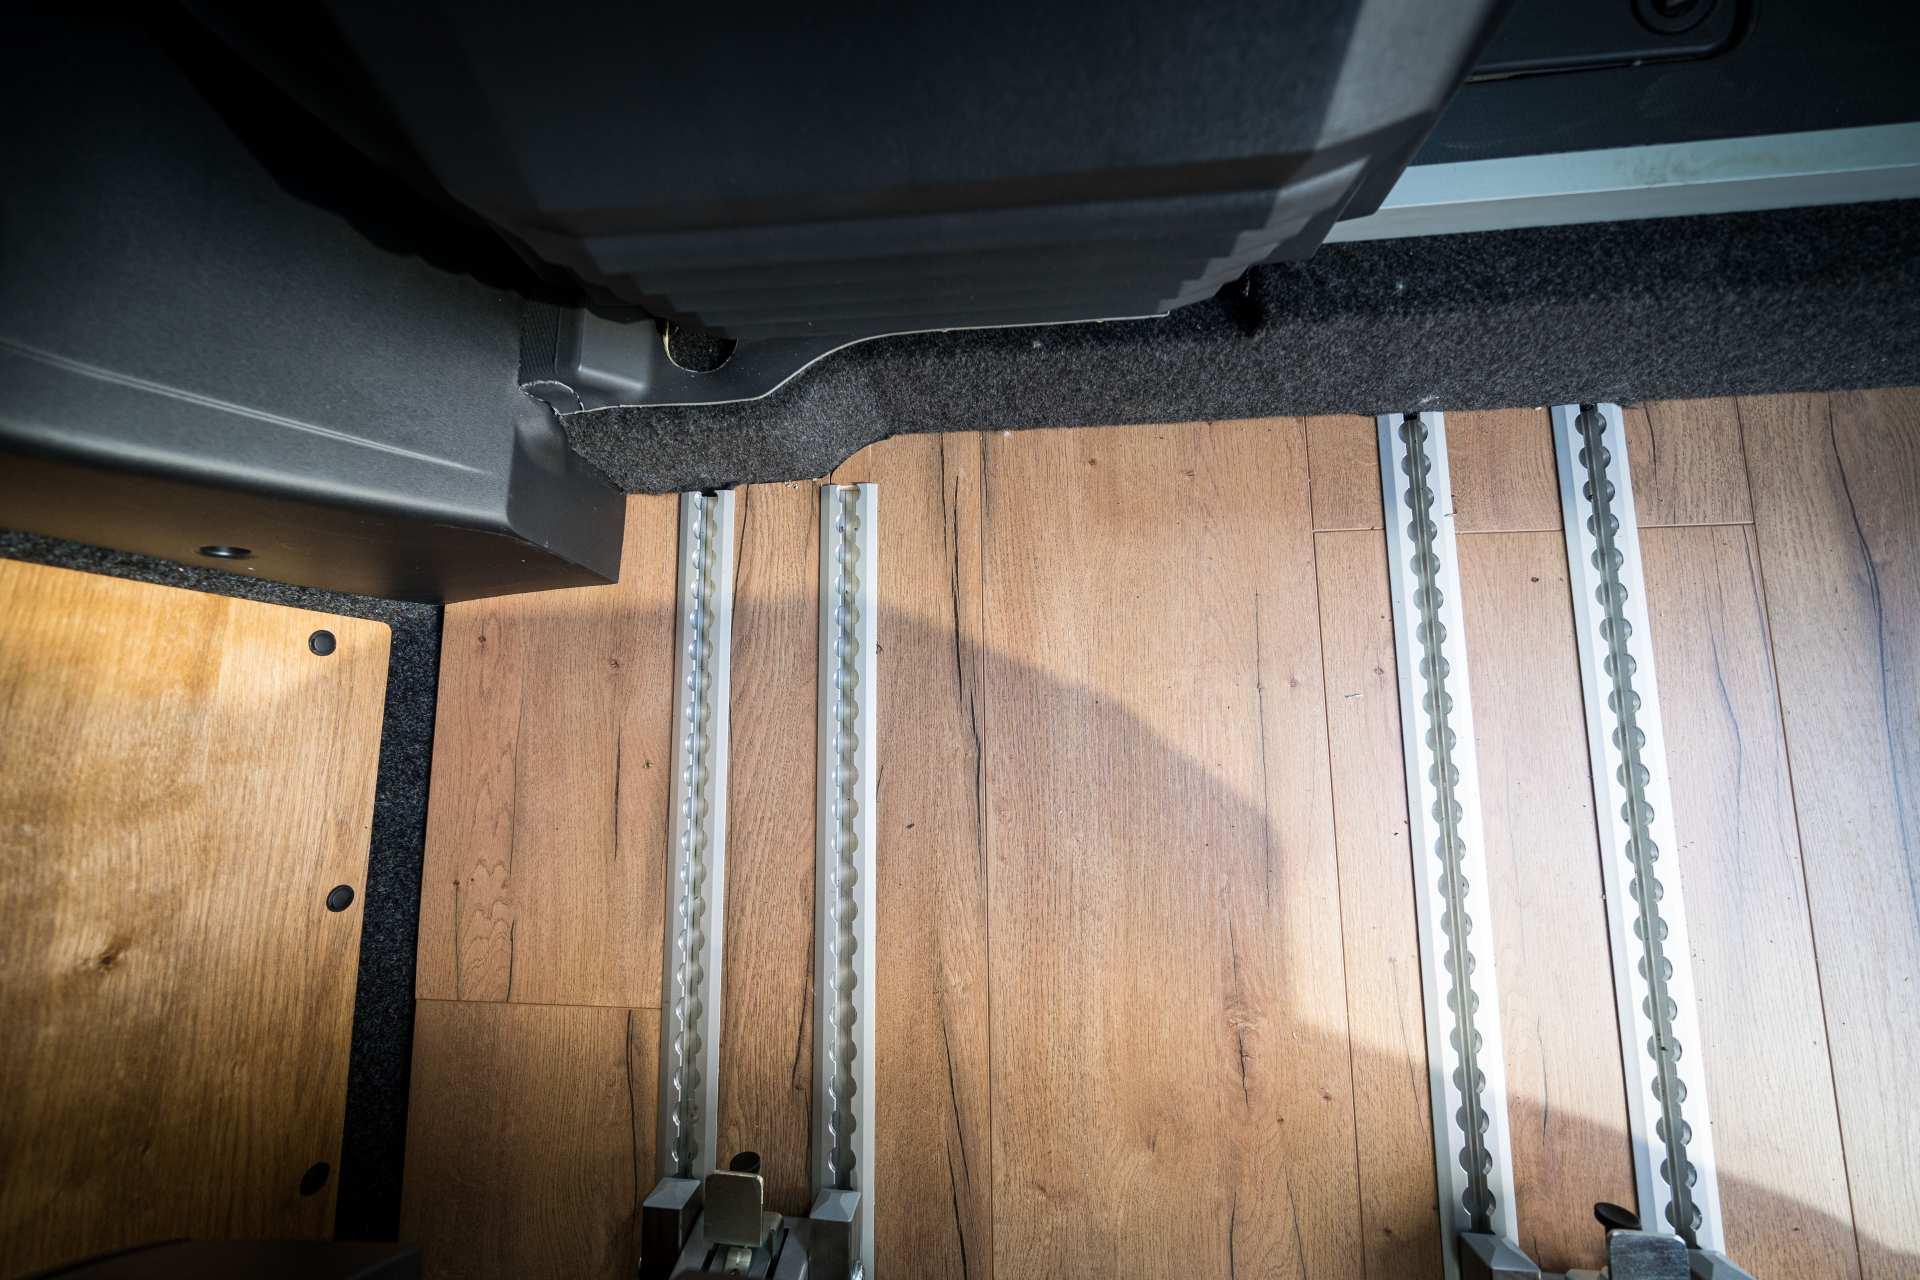 Individualausbau: Zwei-Raumwohnung Peugeot Boxer L2 H2 - 42